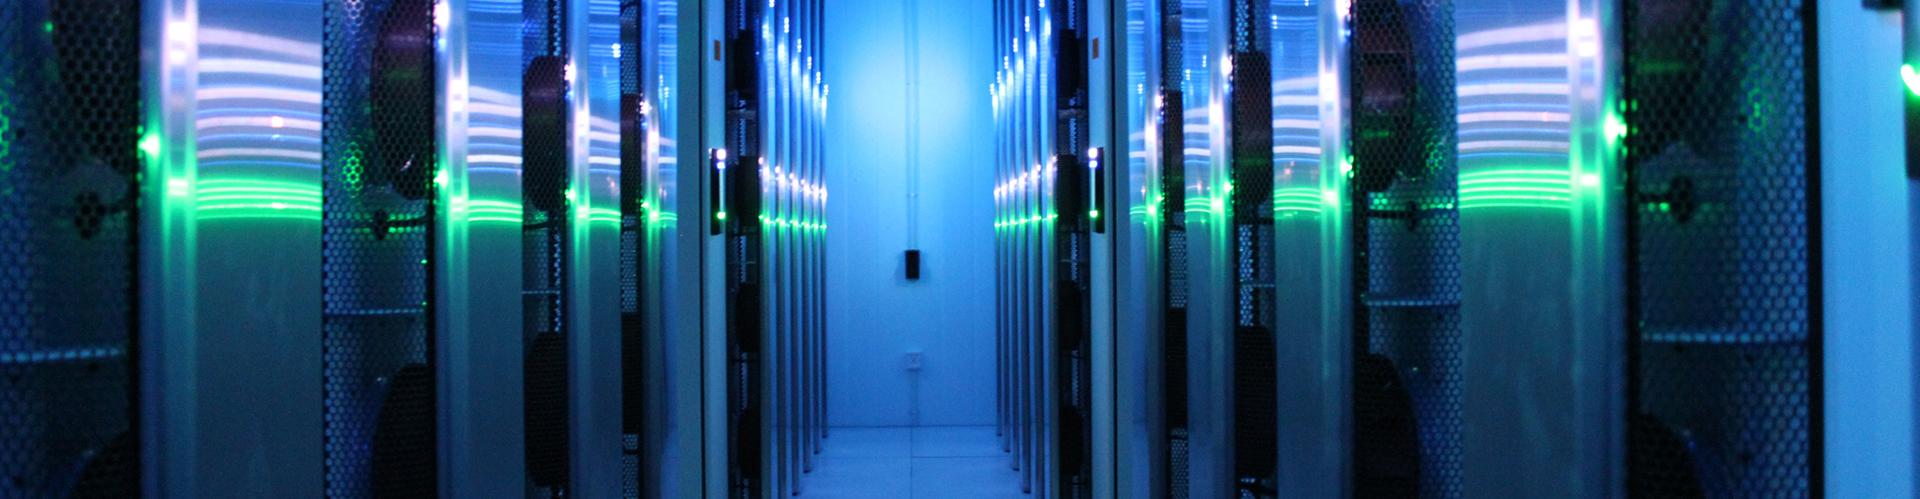 High performance computing data centres